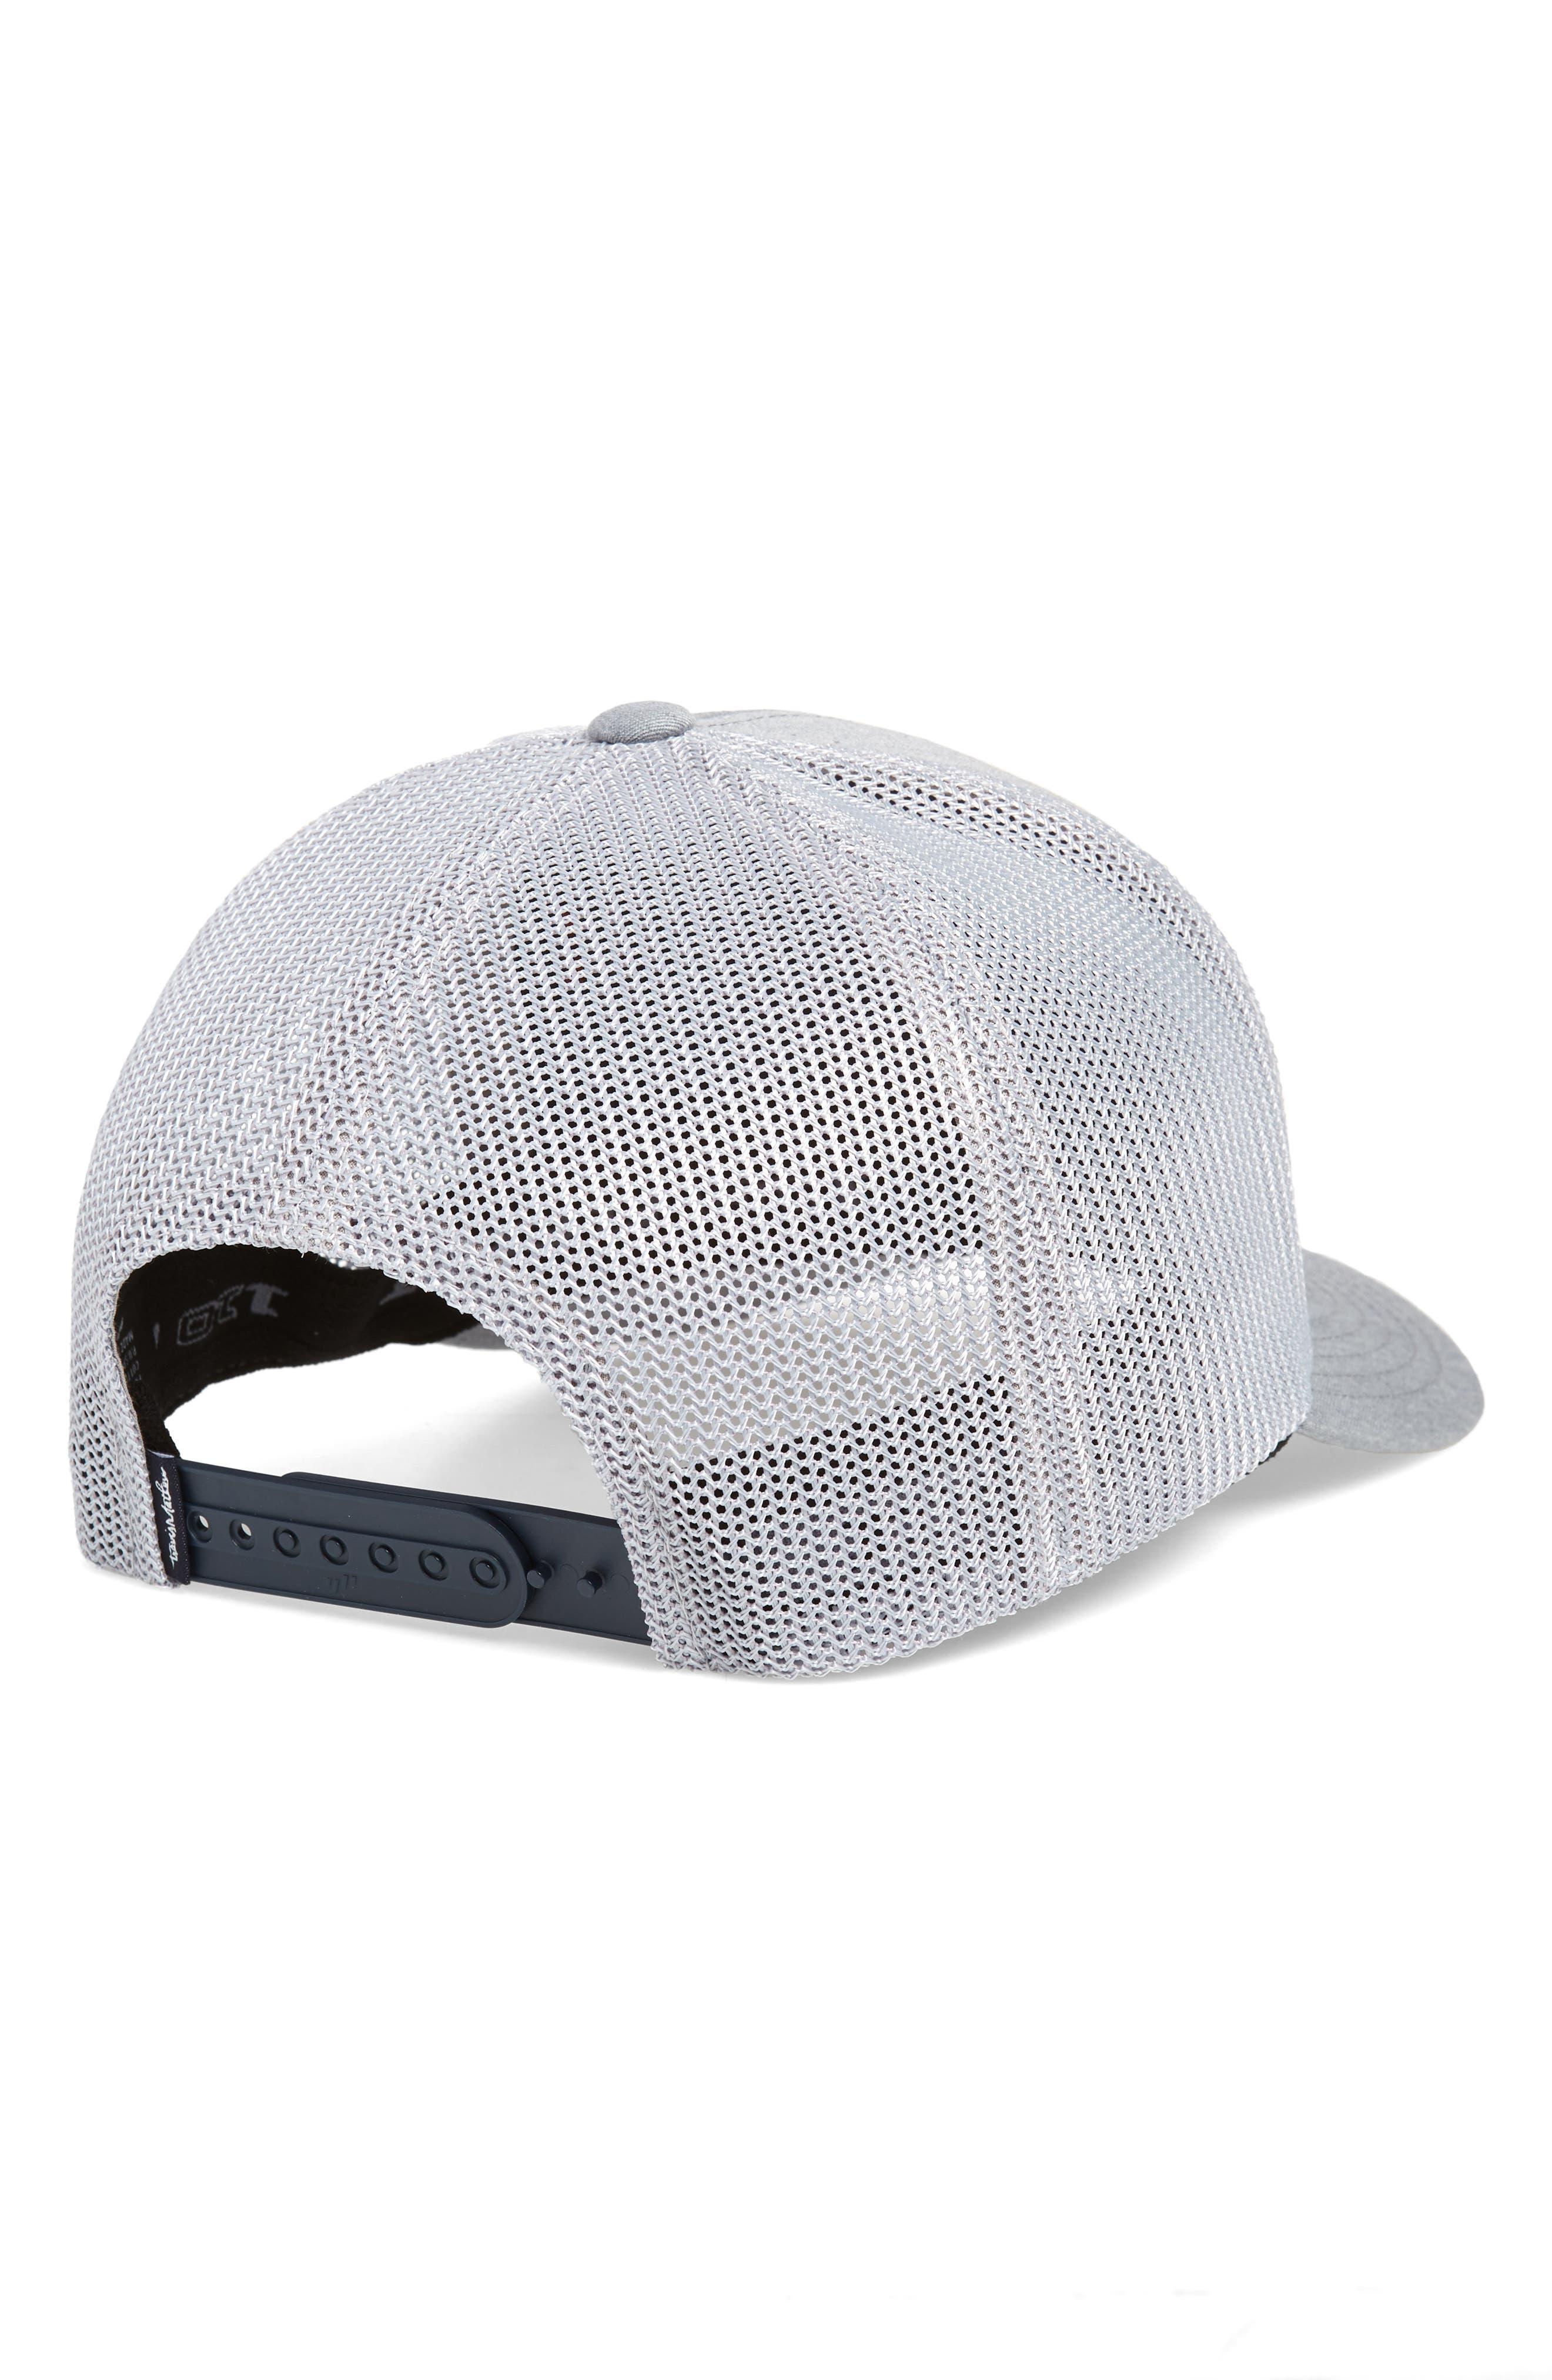 06d1b122d Men's Hats, Hats for Men | Nordstrom